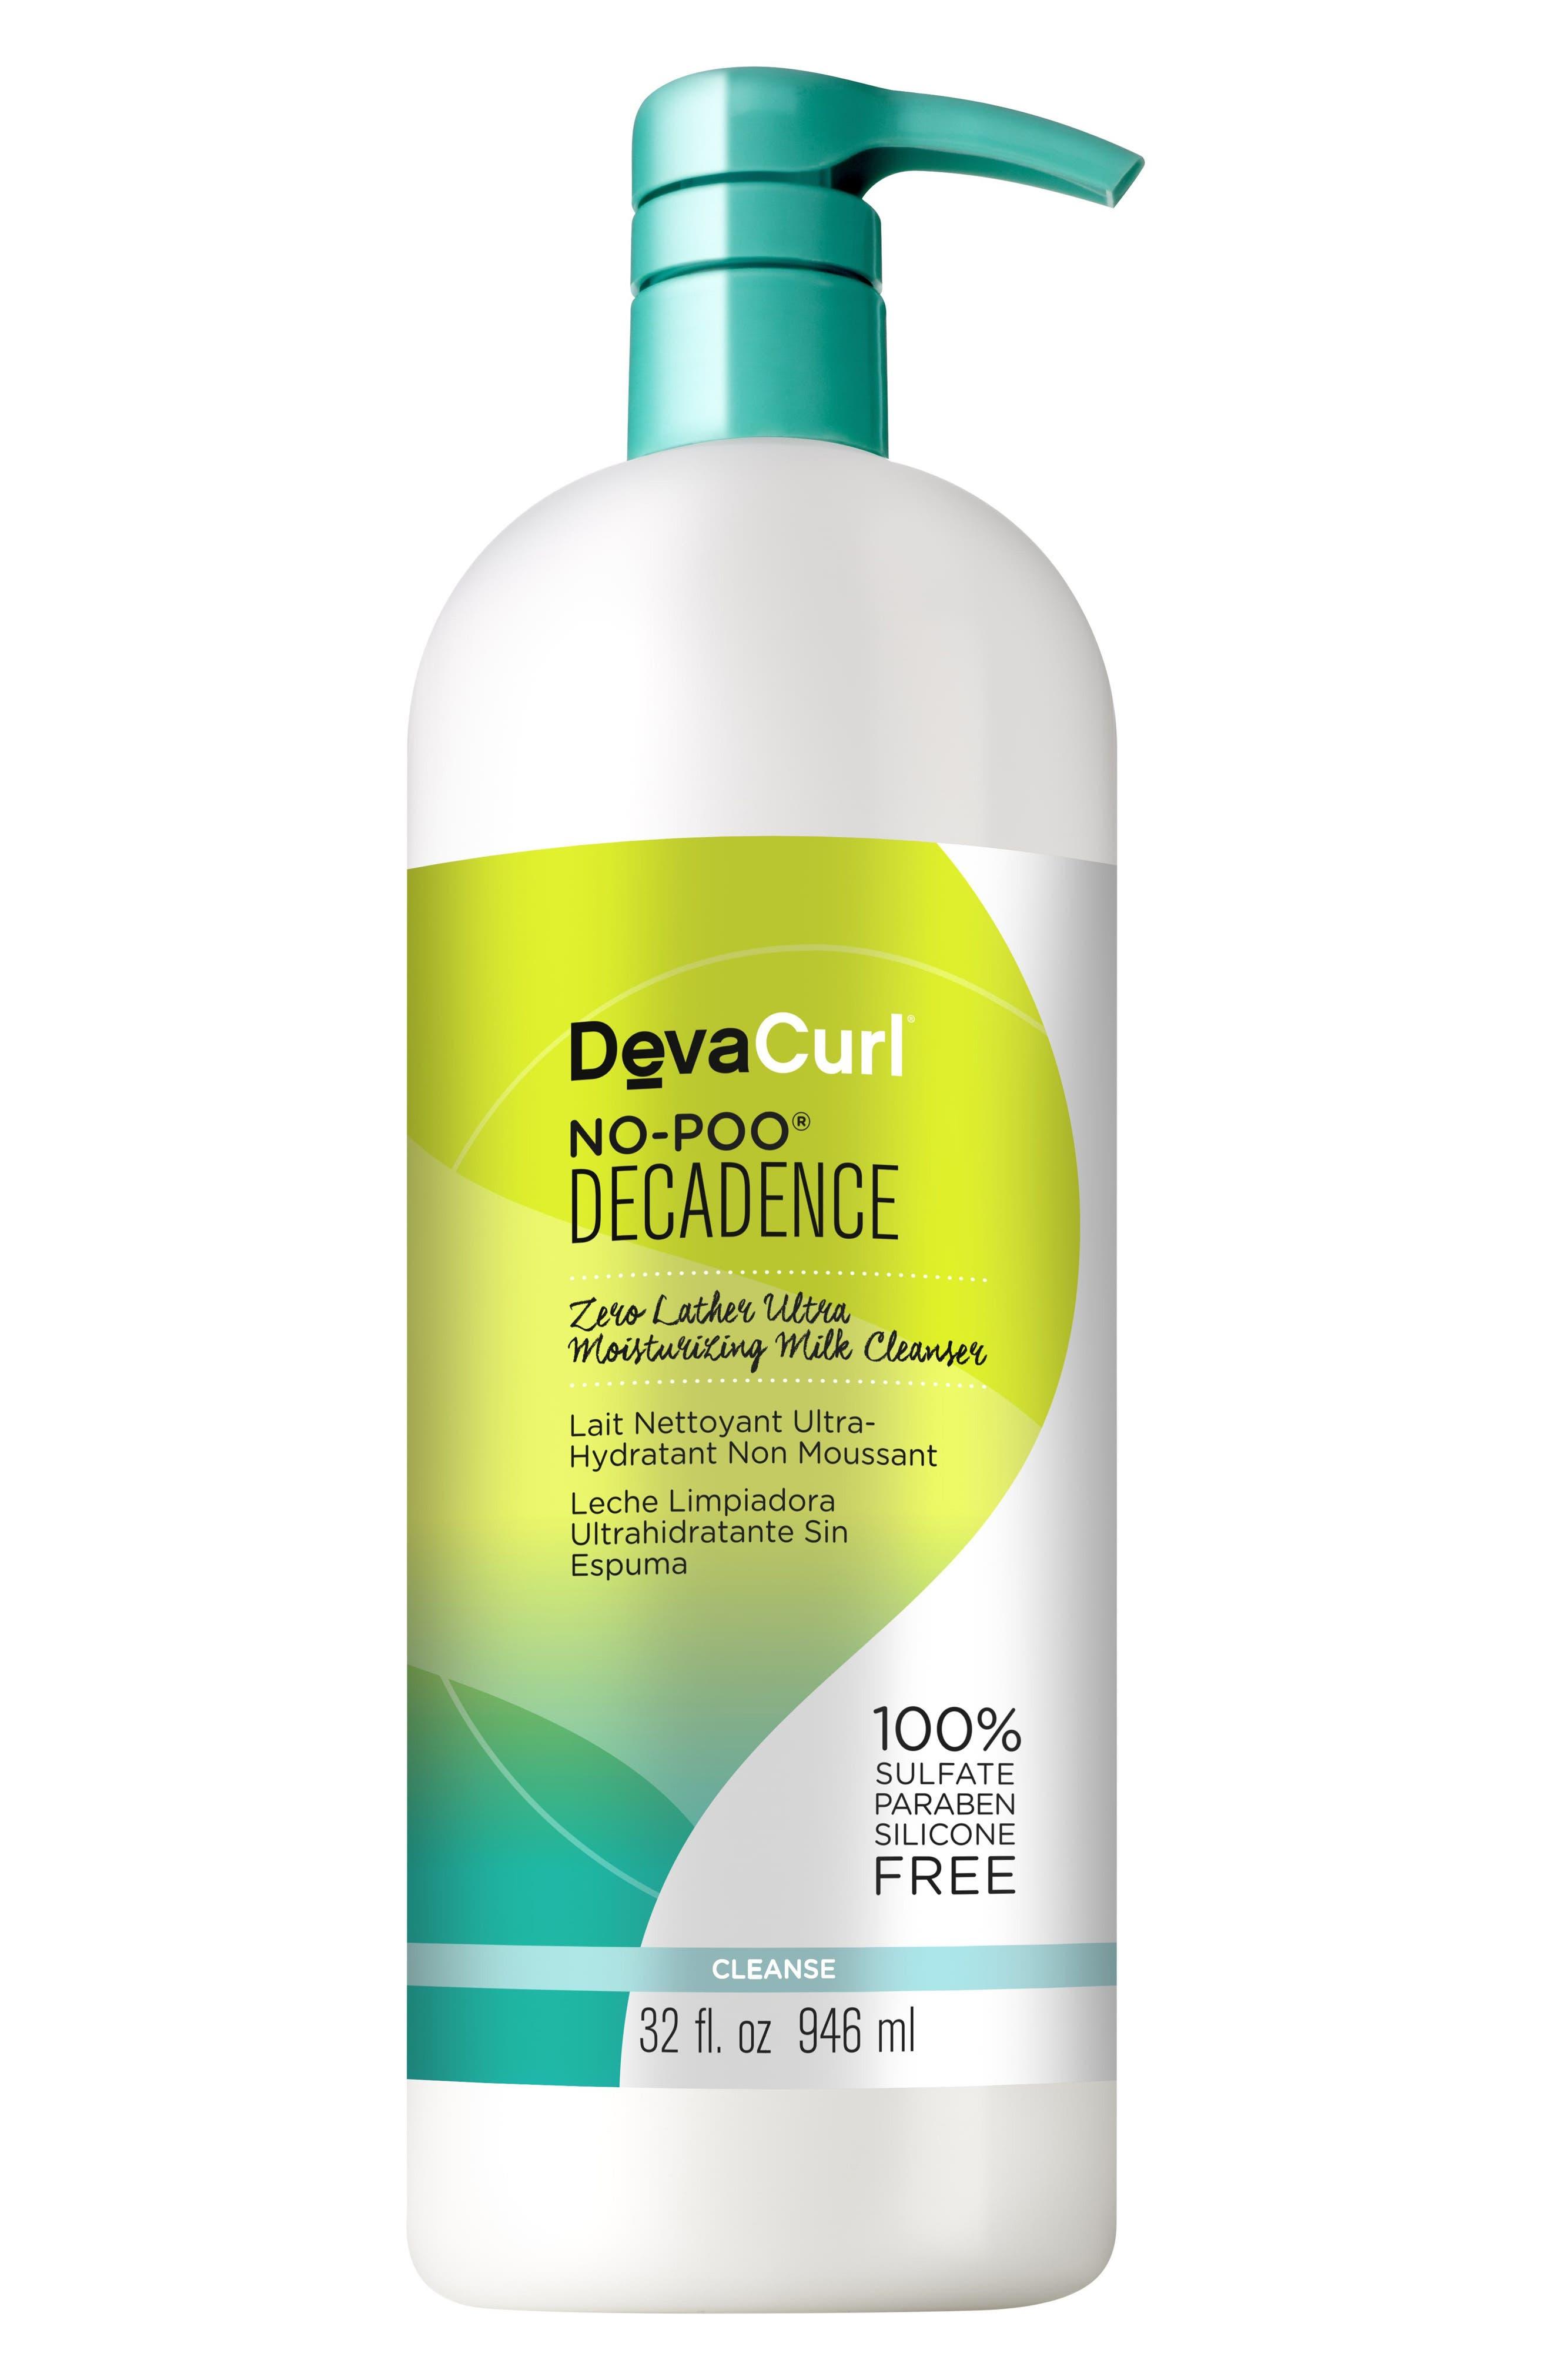 DevaCurl No-Poo® Decadence' Zero Lather Ultra Moisturizing Milk Cleanser